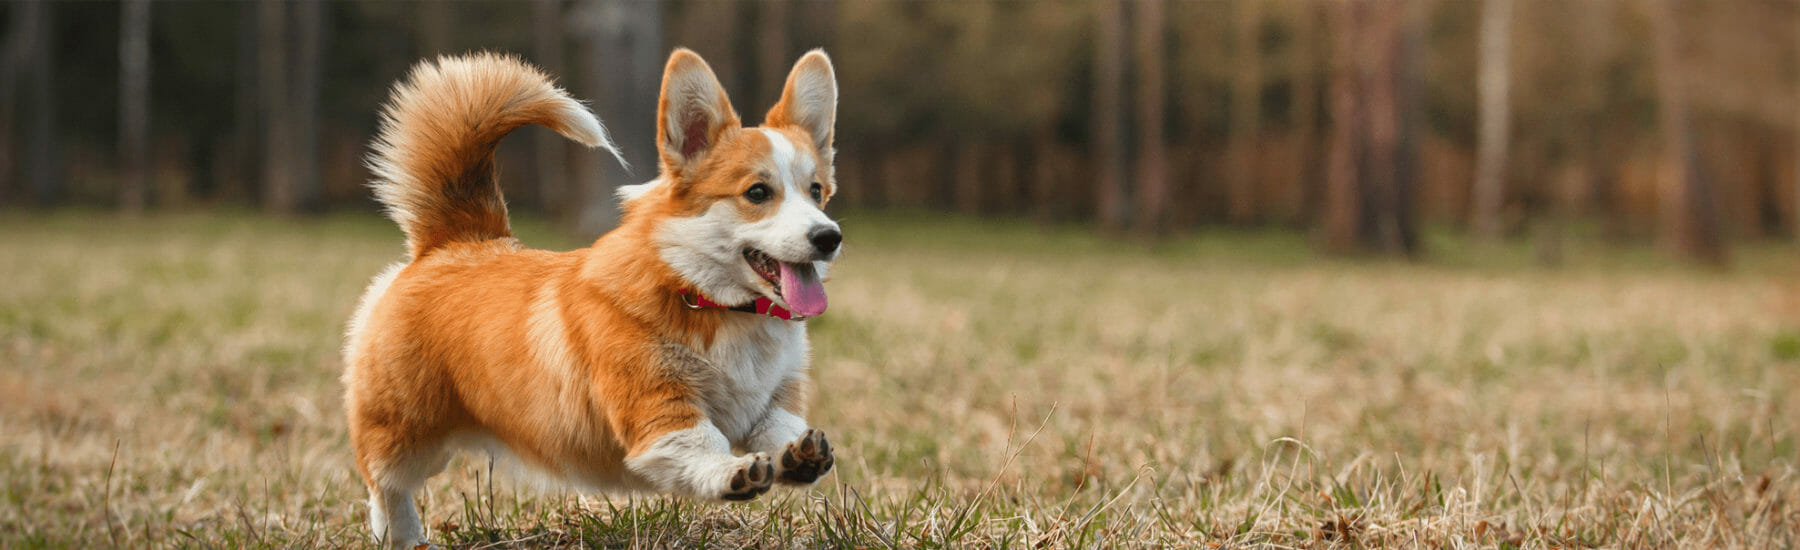 Small orange dog running through a field